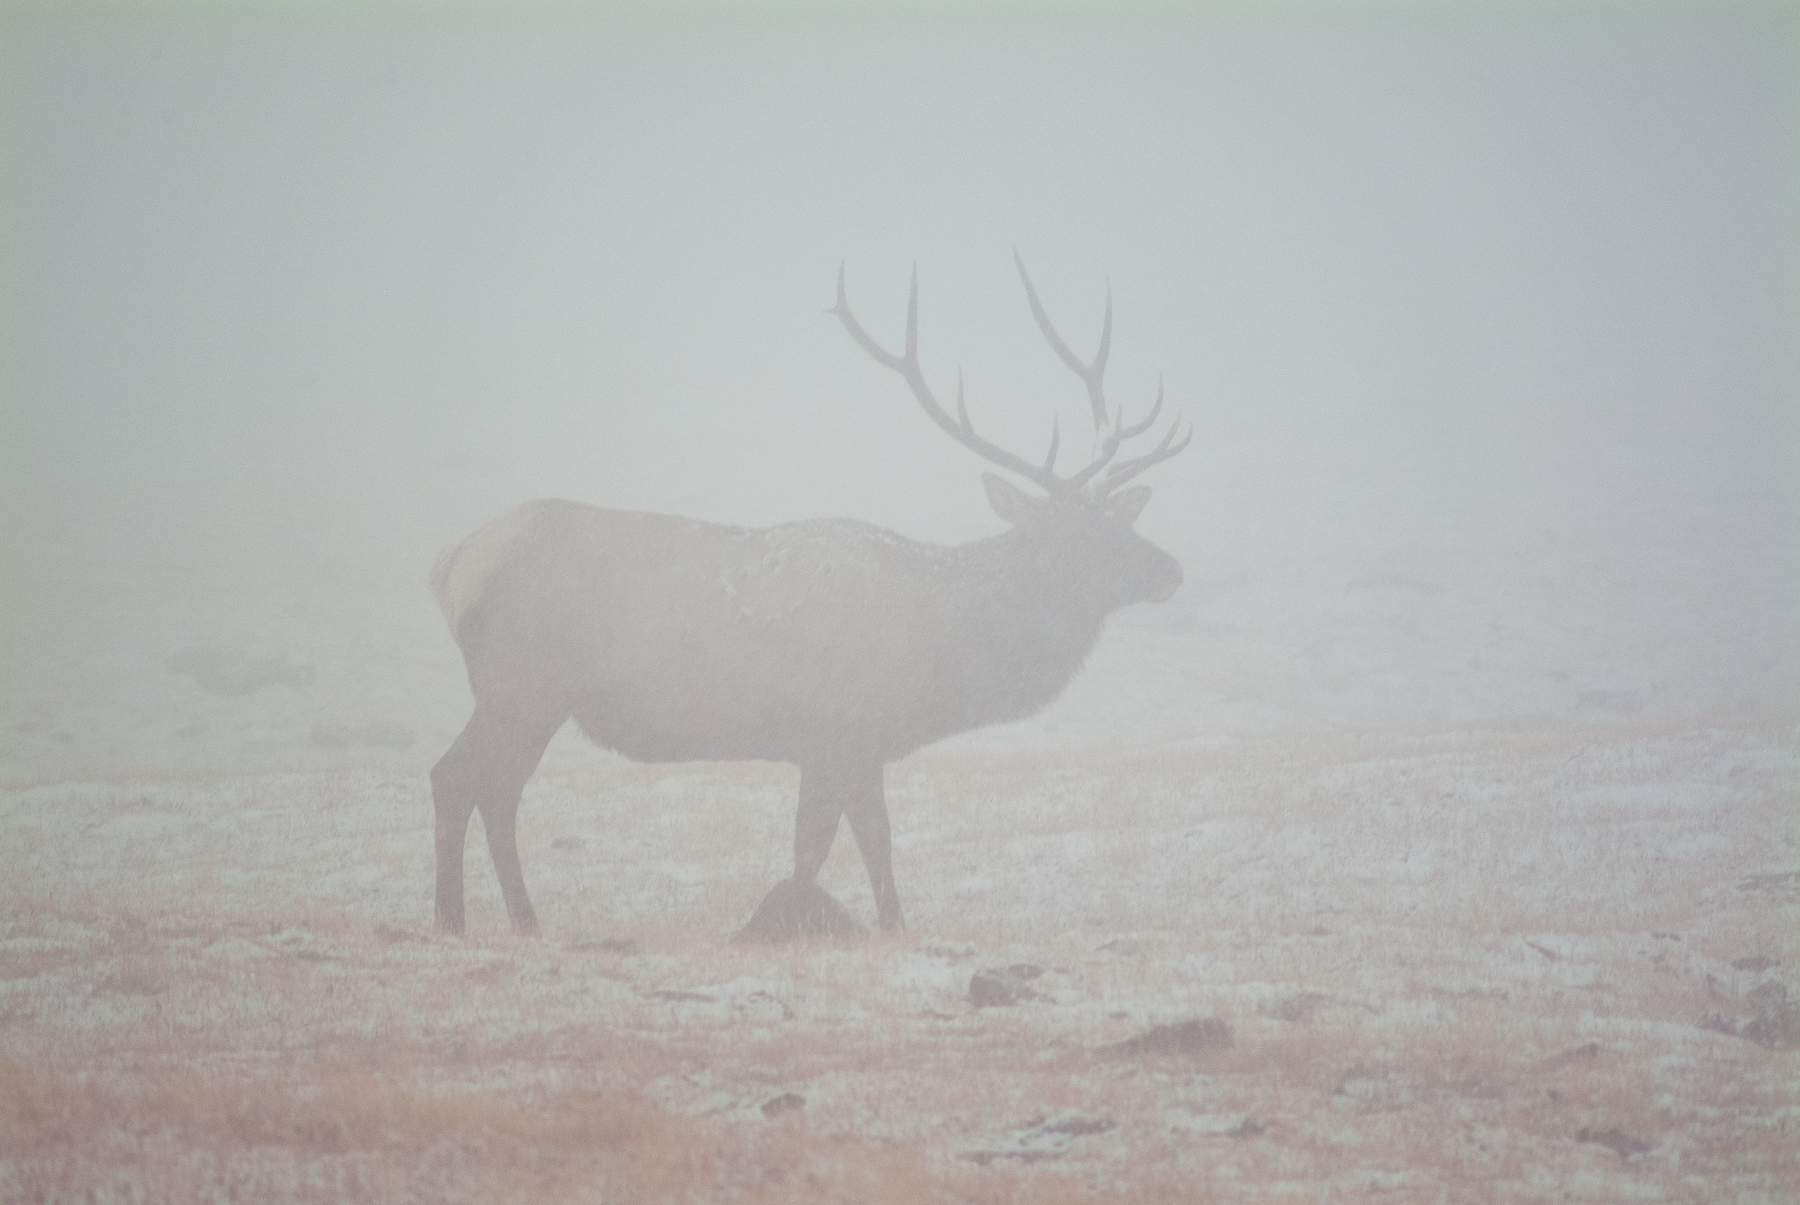 Bull Elk Silhouetted in Snow